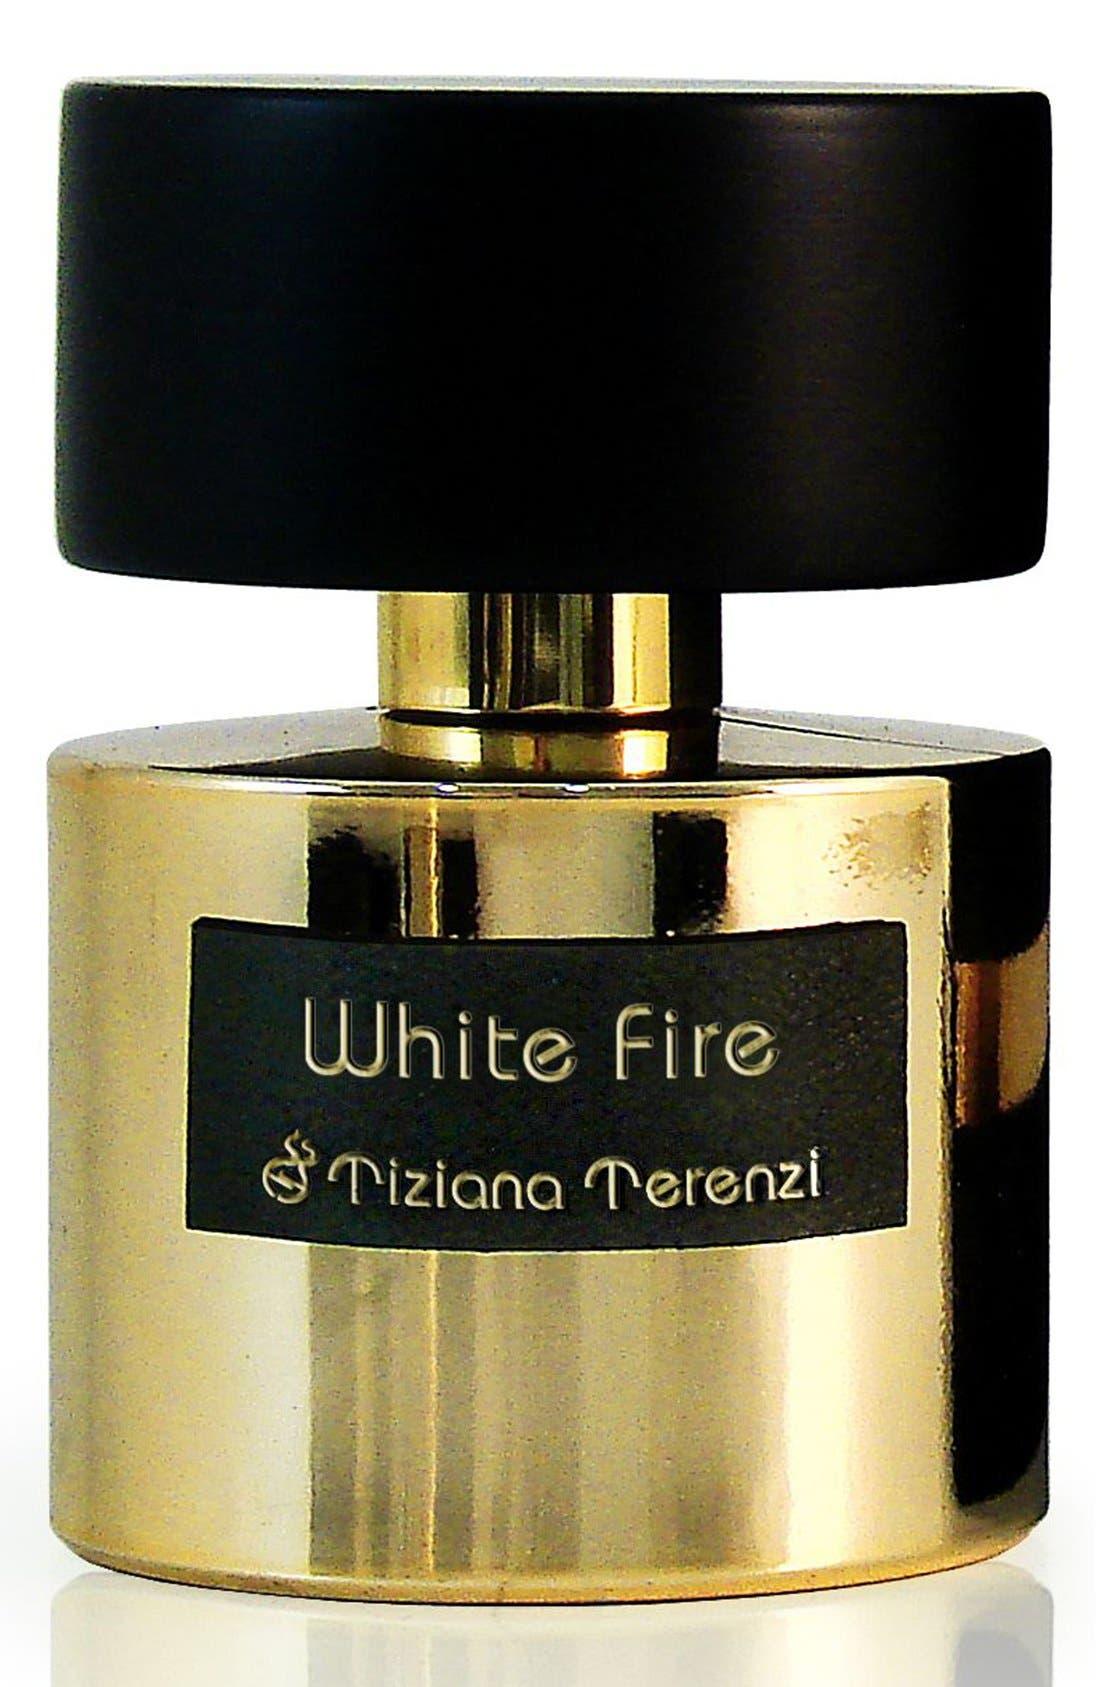 Tiziana Terenzi 'White Fire' Extrait de Parfum